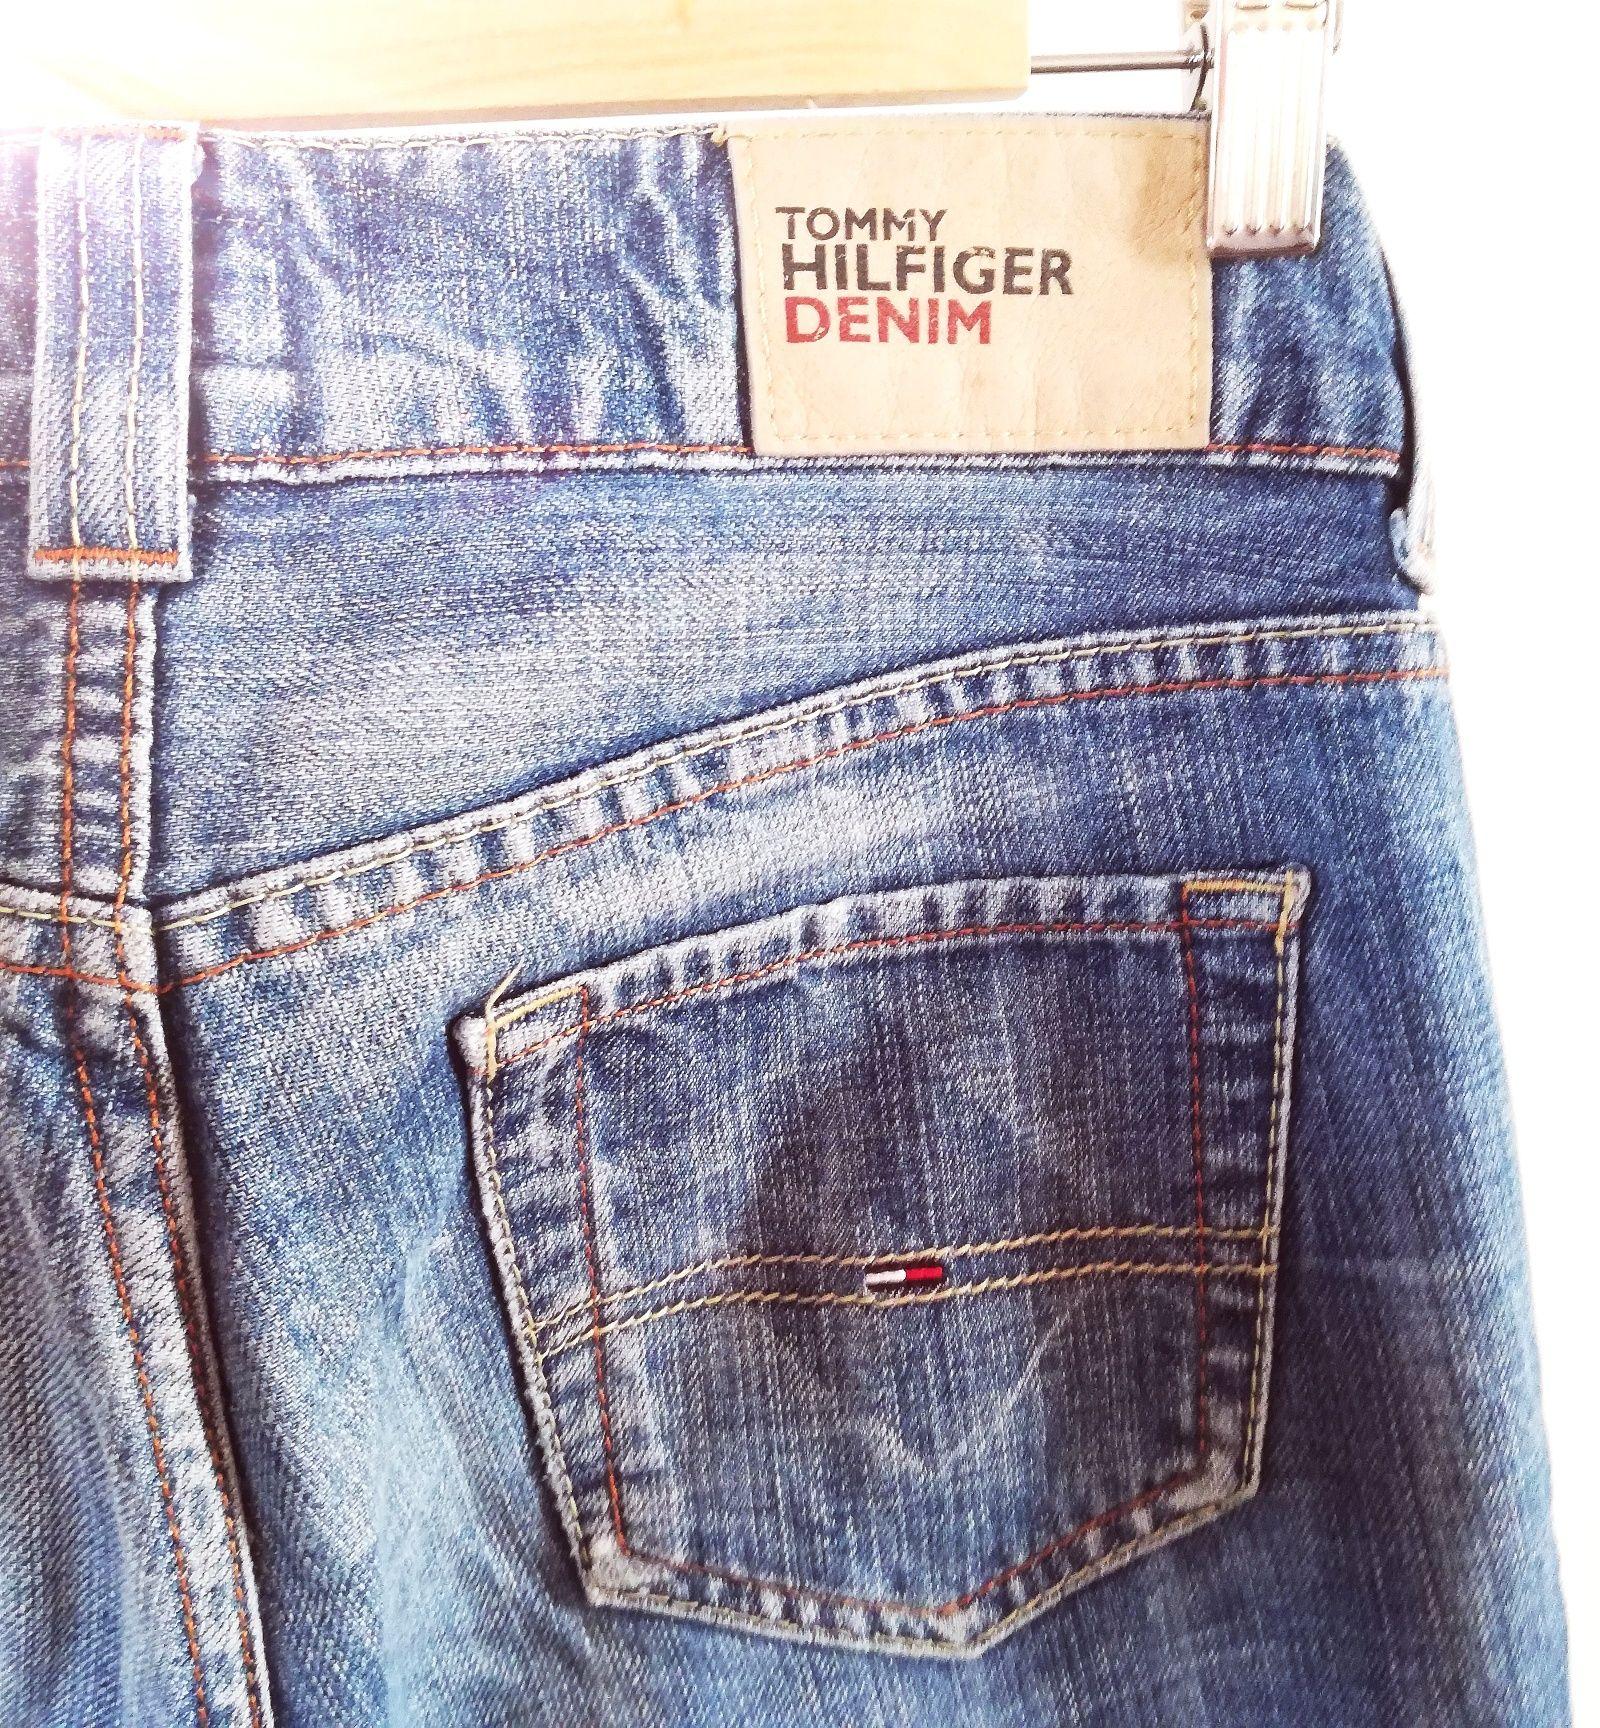 Spodnie jeansy Tommy Hilfiger Denim damskie